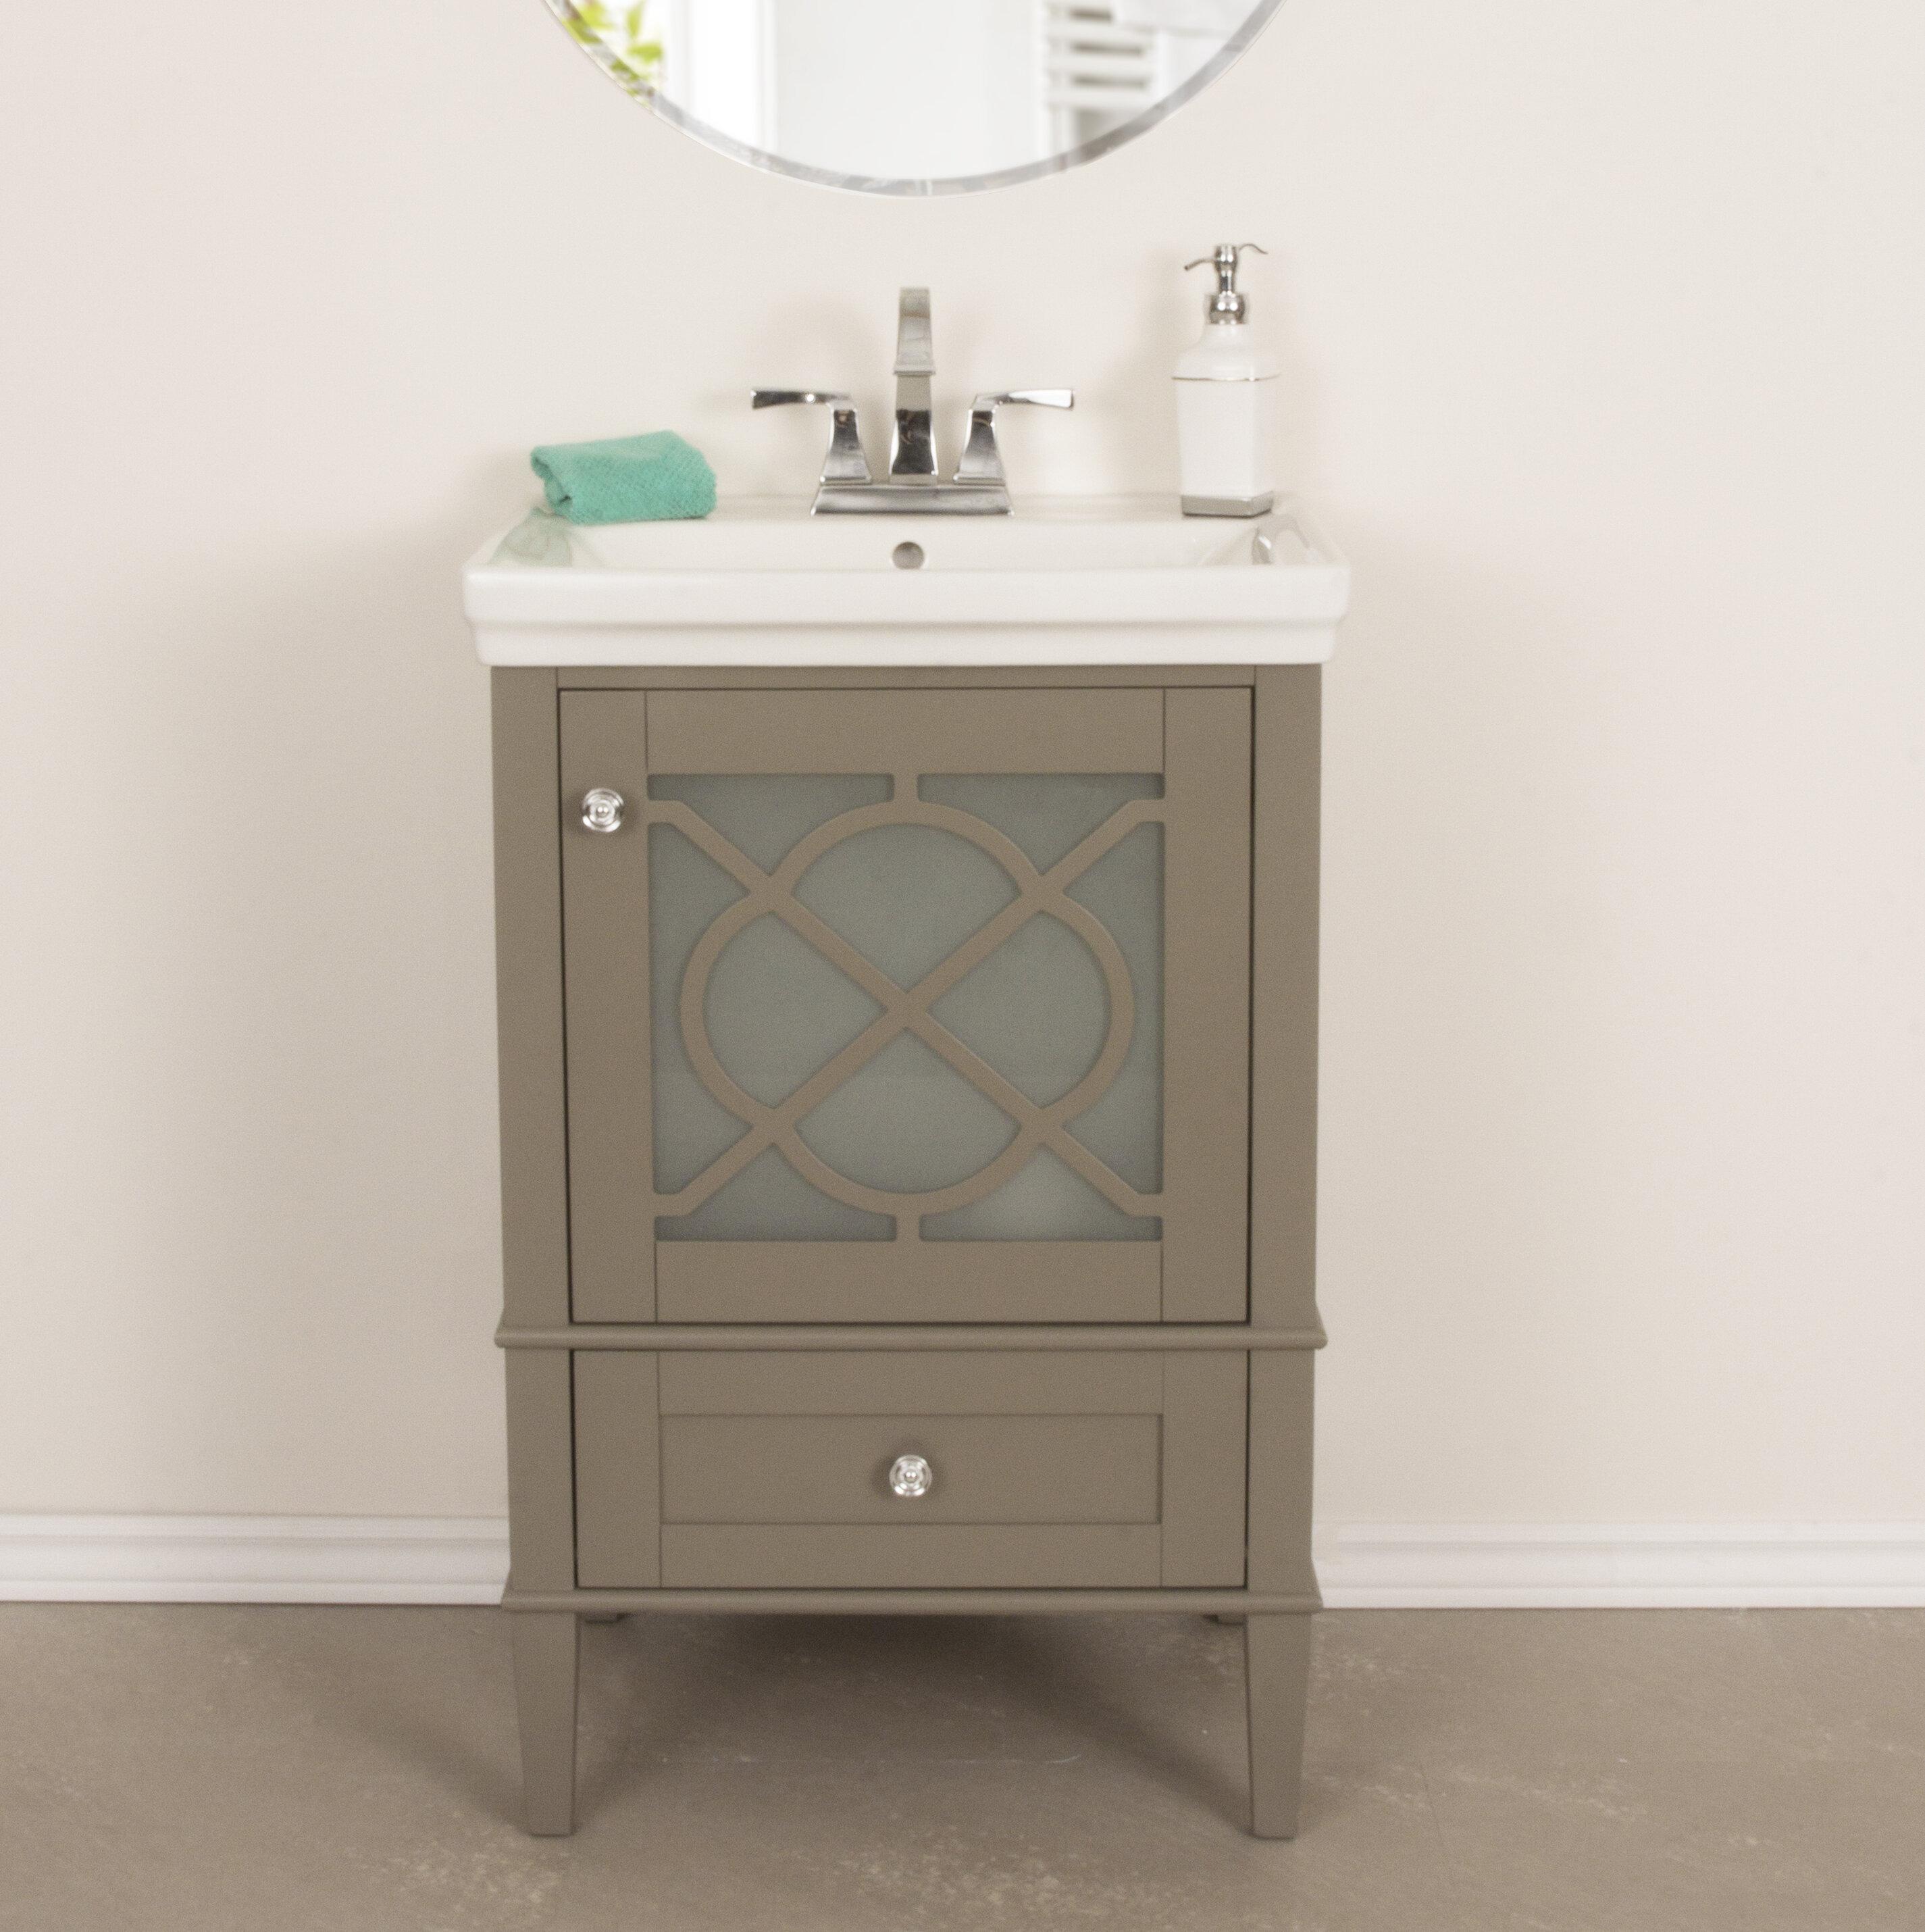 Willa Arlo Interiors Wheatley 24 Single Bathroom Vanity Set Reviews Wayfair